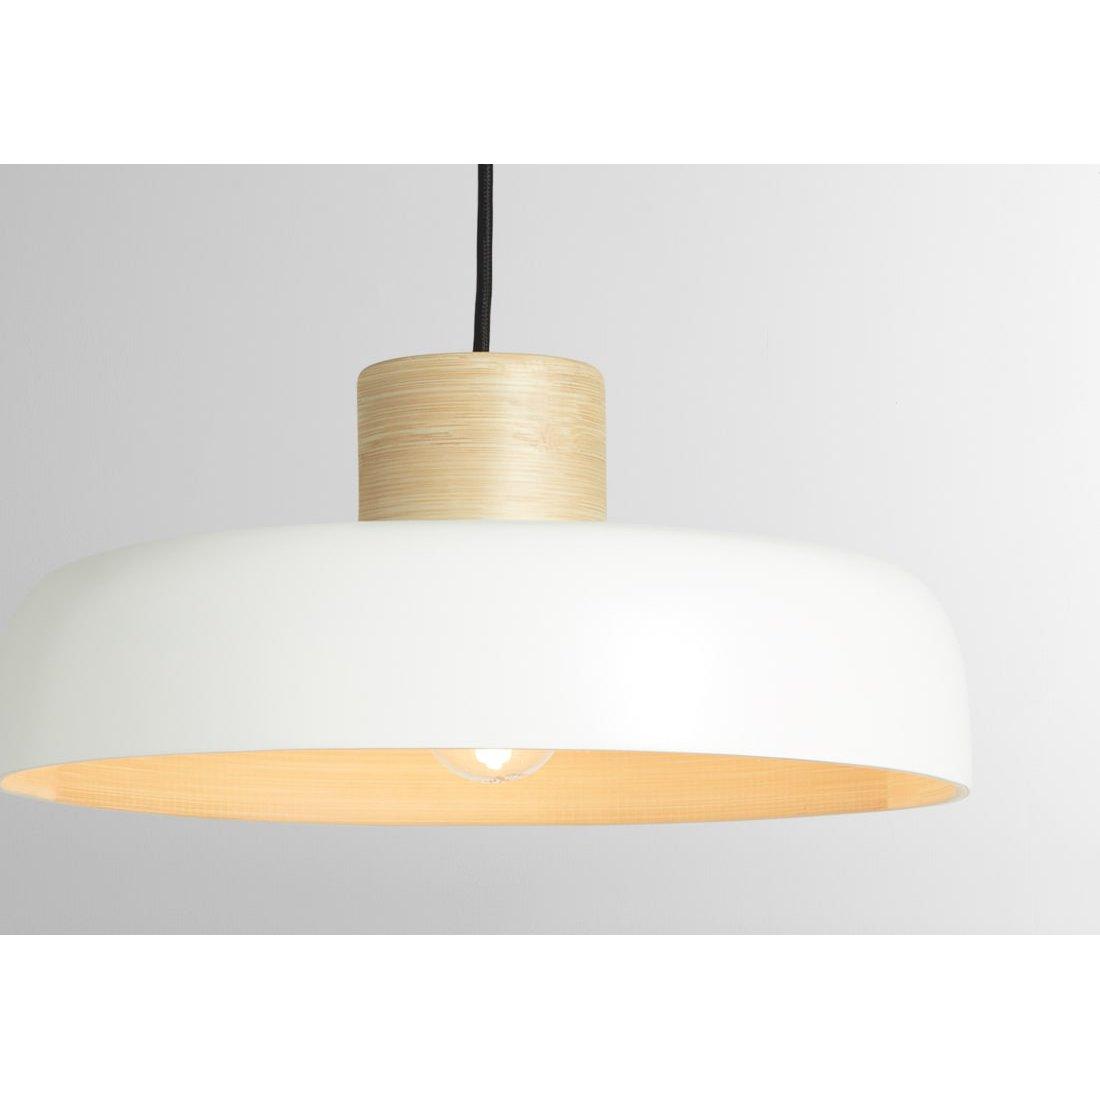 image-Todd Pendant Lamp Shade, White & Bamboo